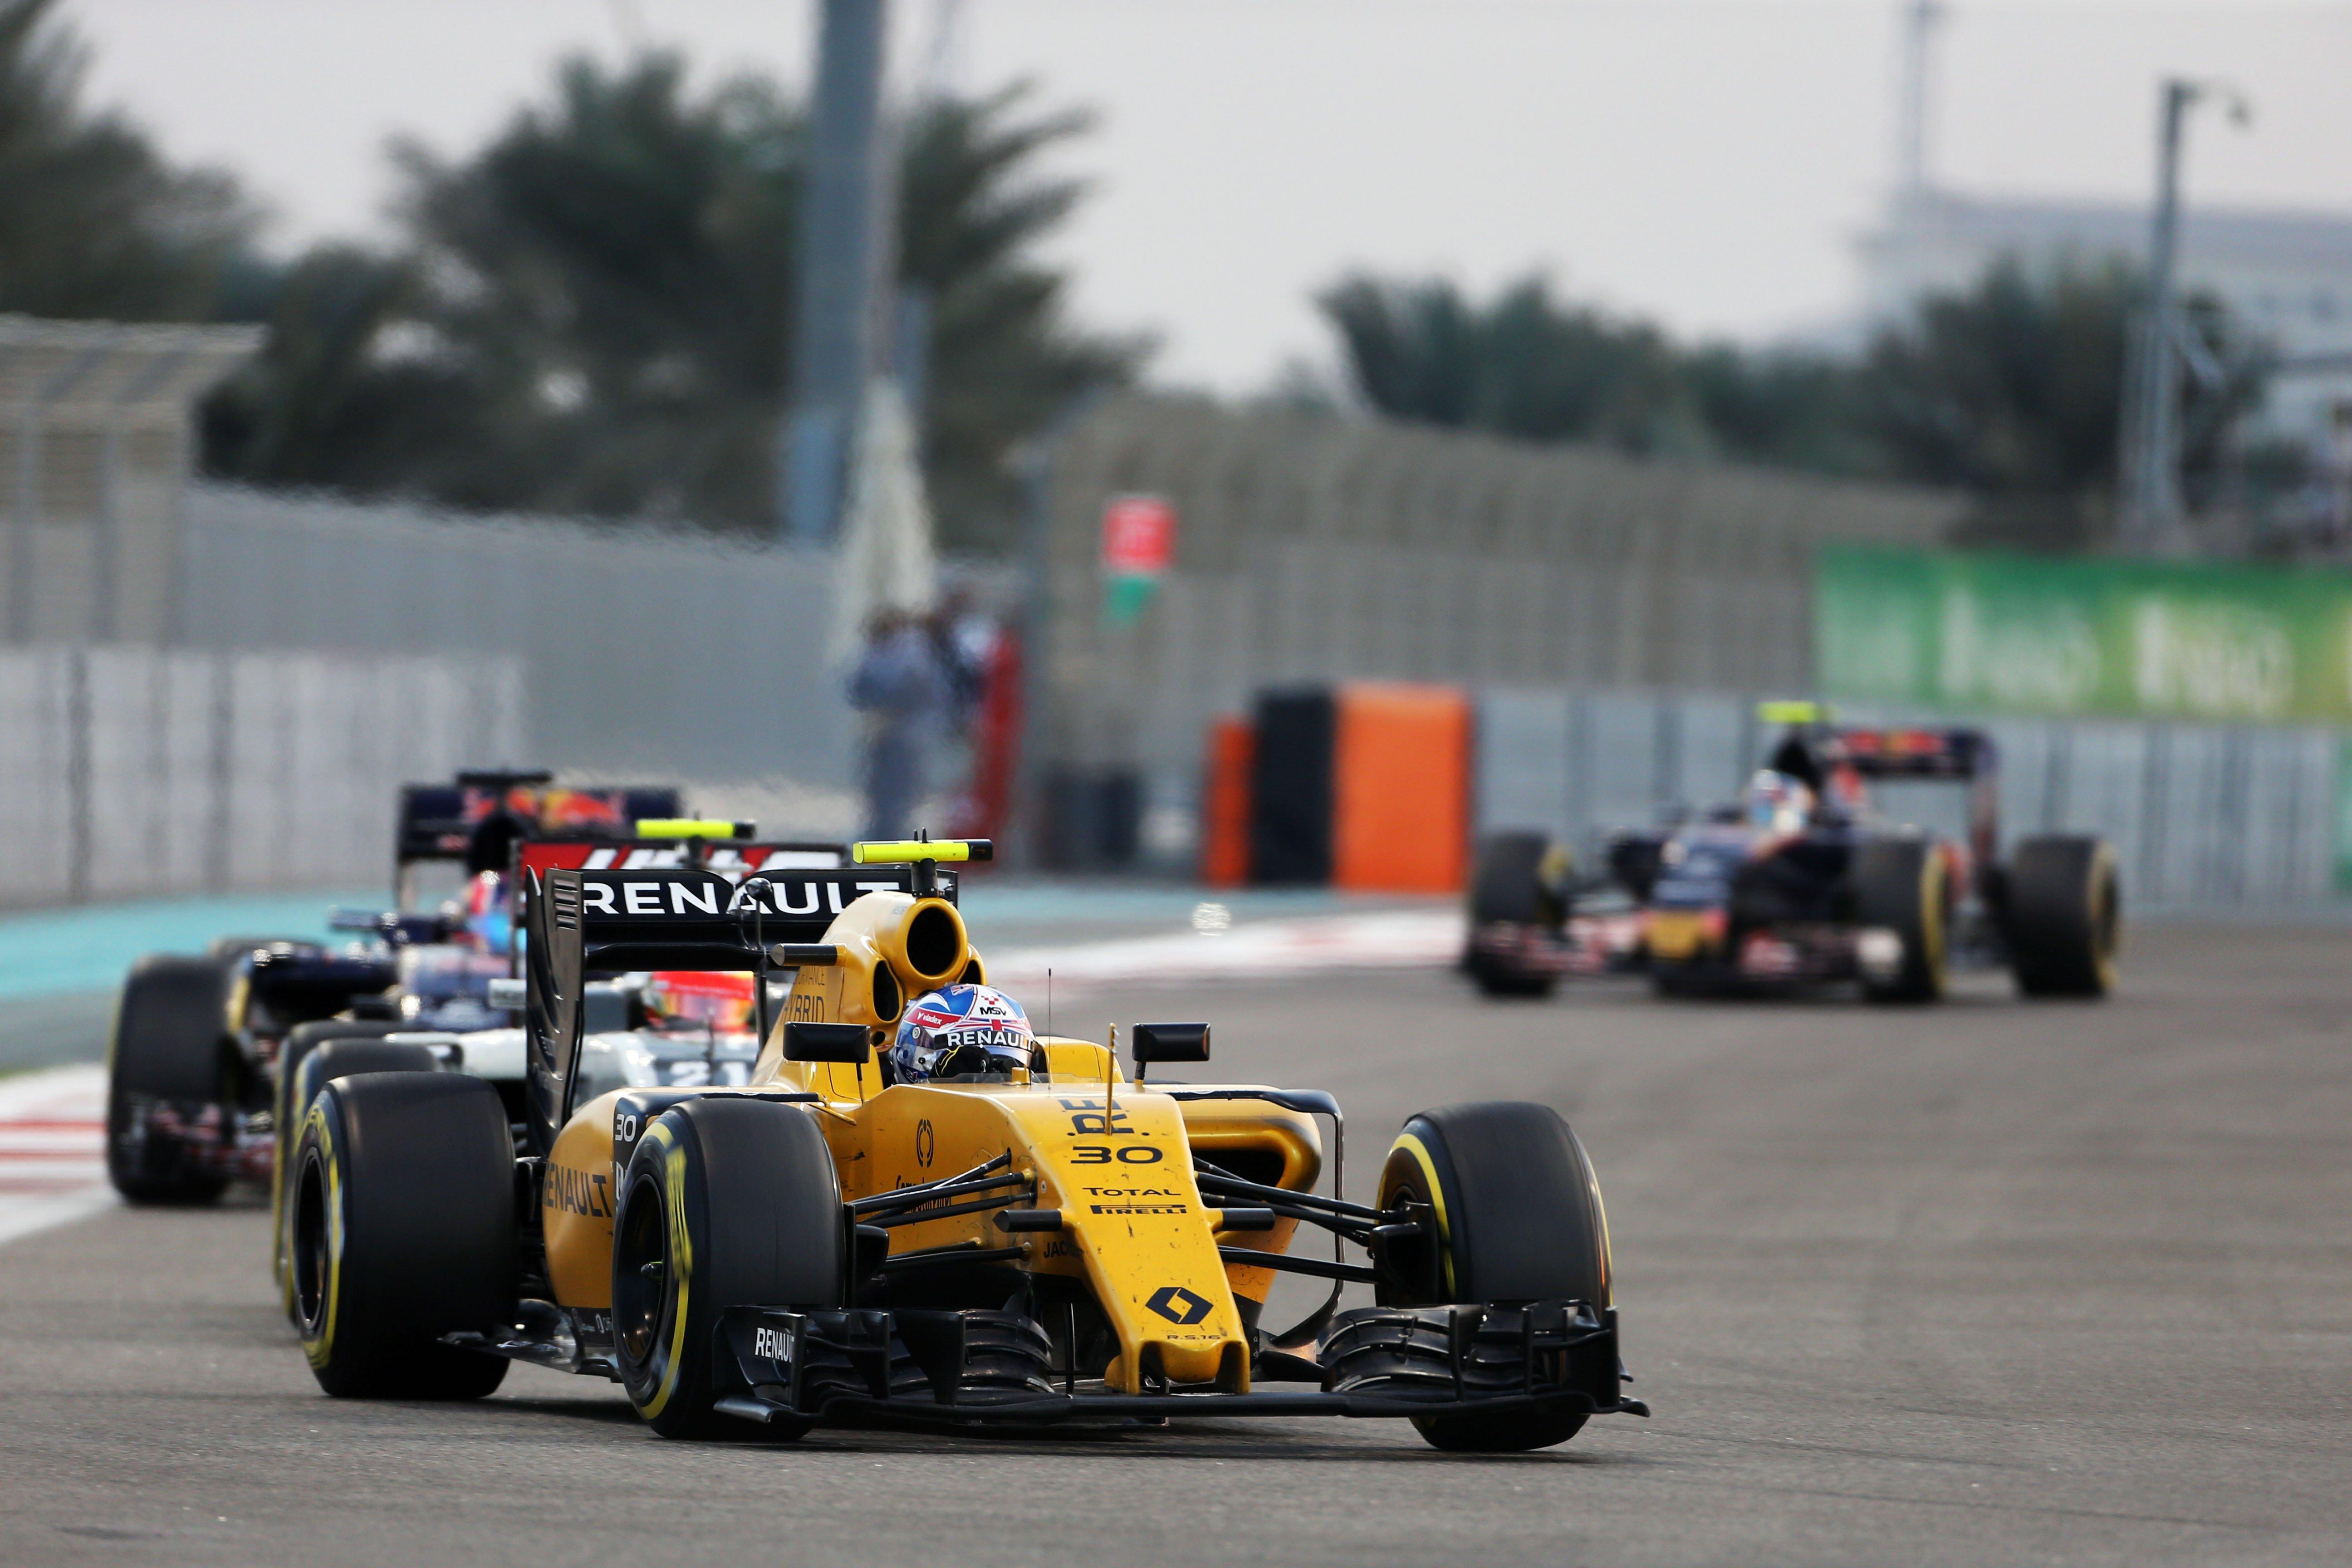 Formula One World Championship 2016, Round 21, Abu Dhabi Grand Prix, Abu Dhabi, United Arab Emirates, Sunday 27 November 2016 – Jolyon Palmer (GBR) Renault Sport F1 Team RS16.